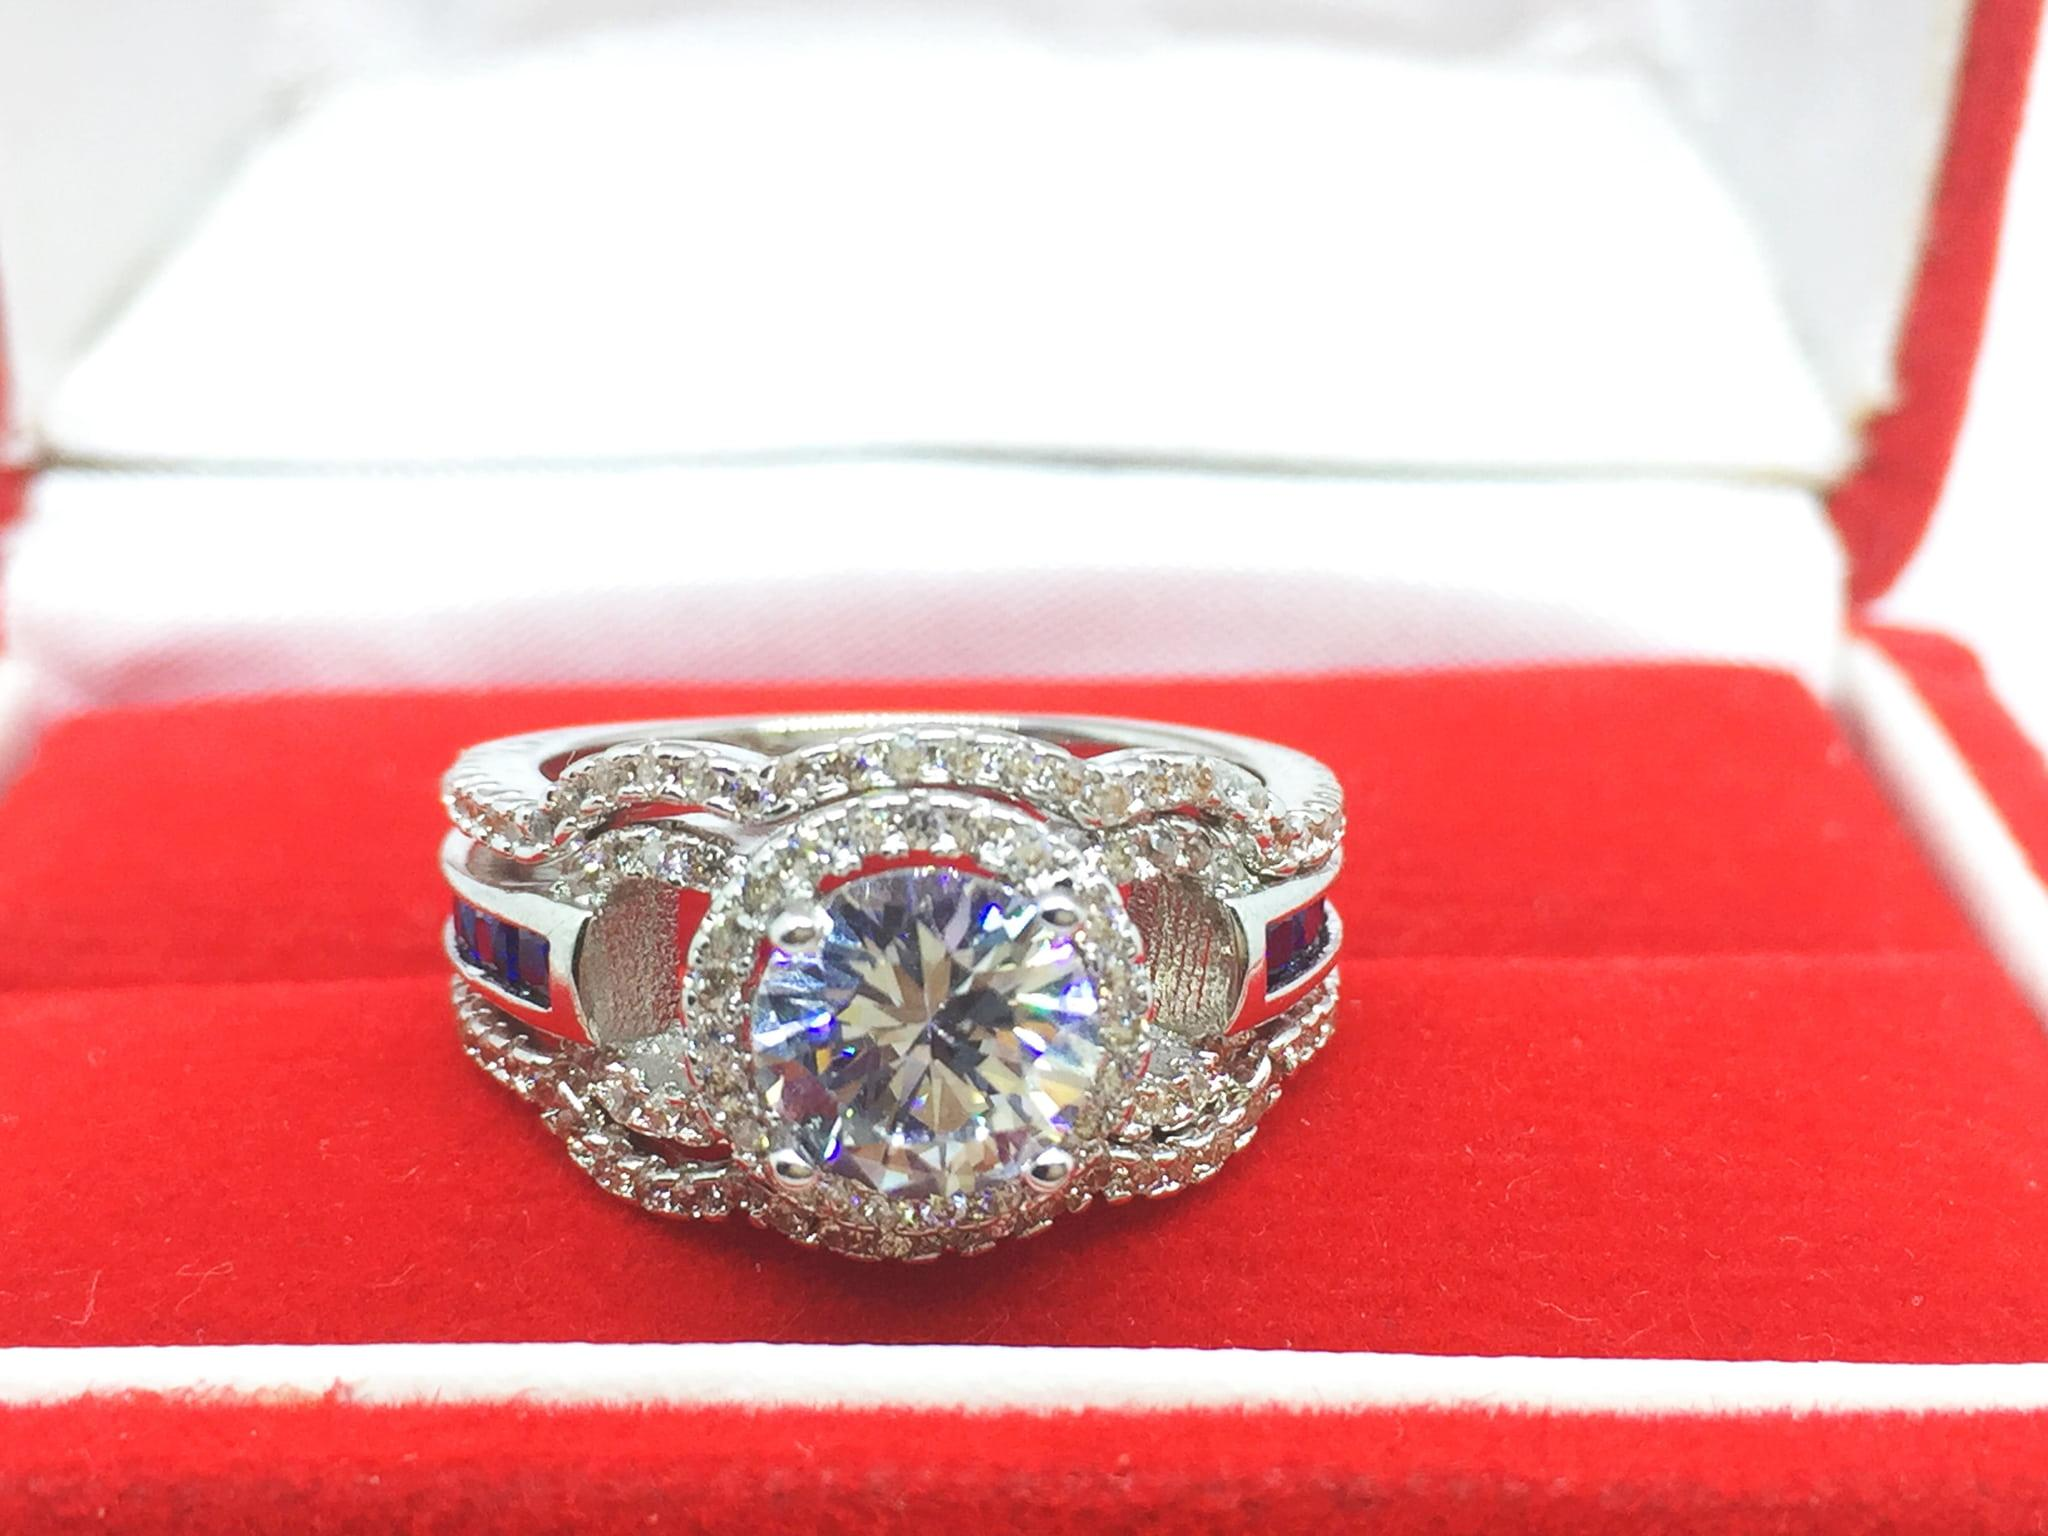 Informasi Harga Cincin Emas Putih Murah 2018 Cari Banding Tiaria Djxjz003 Tunangan Berlian New Promo Perhiasan Set 3 Pcs Lapis Batu Biru Samping Br157